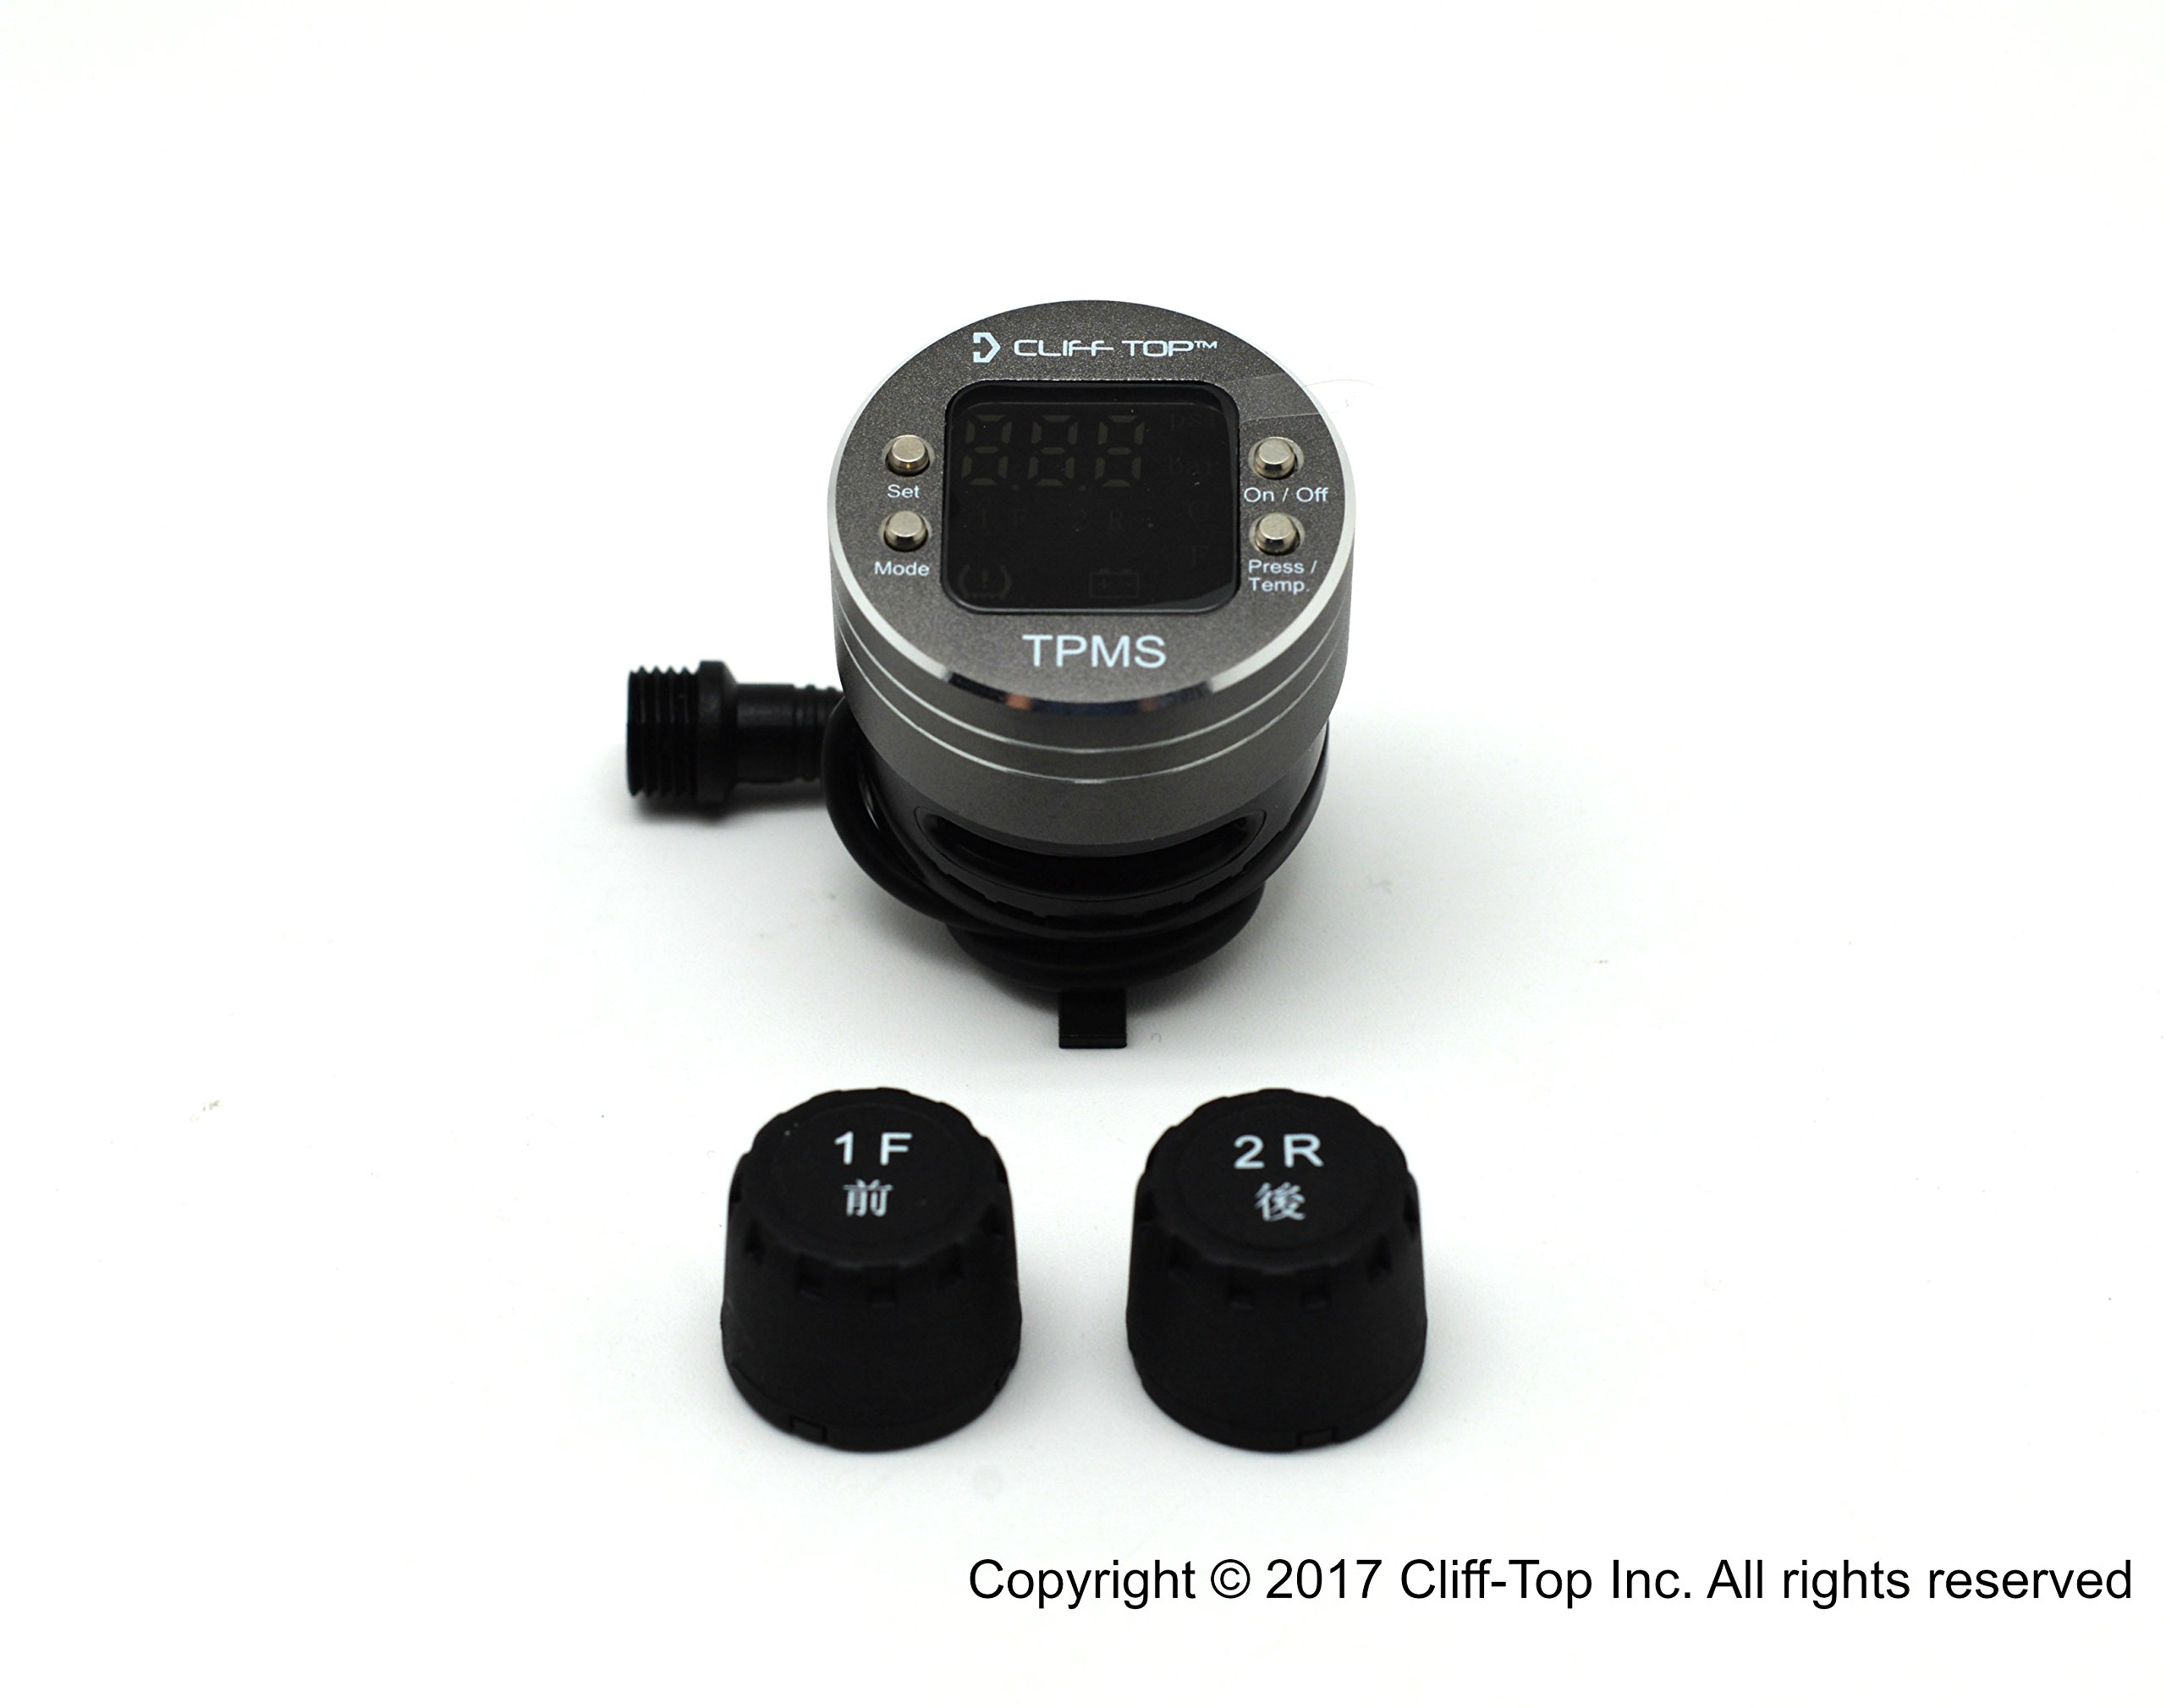 Cliff-Top Waterproof Motorcycle DIY Tire Pressure Monitoring System (TPMS) with External Sensor LCD Display